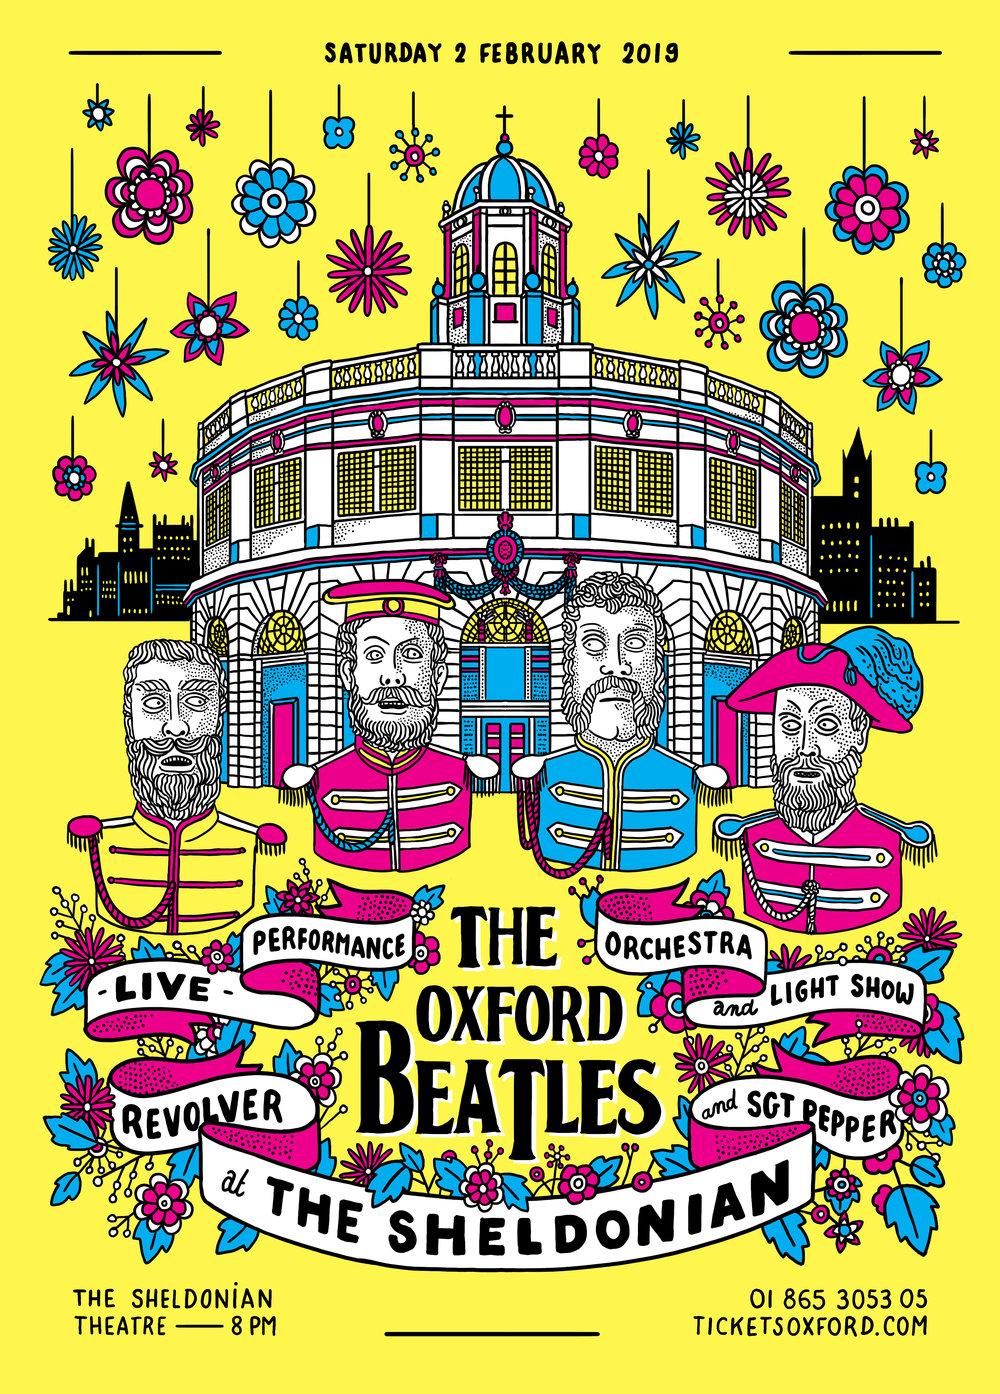 The OxfordBeatles_01.jpg